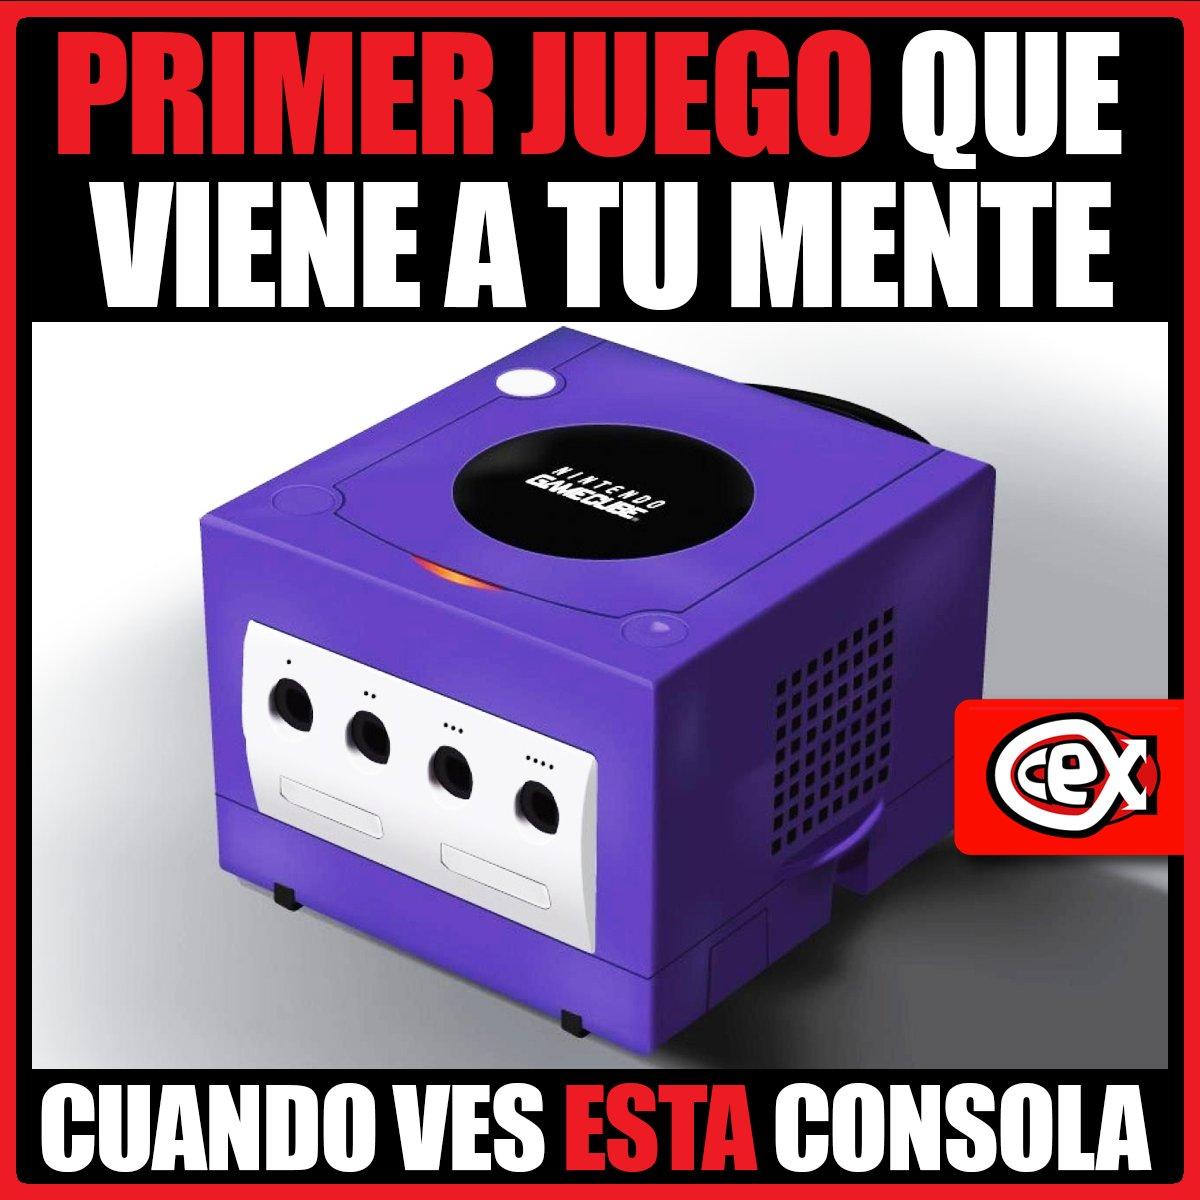 Super Smash Bros, Zelda... ¿Metroid? ¡Cuéntanos! pic.twitter.com/GJQyxO65Xv